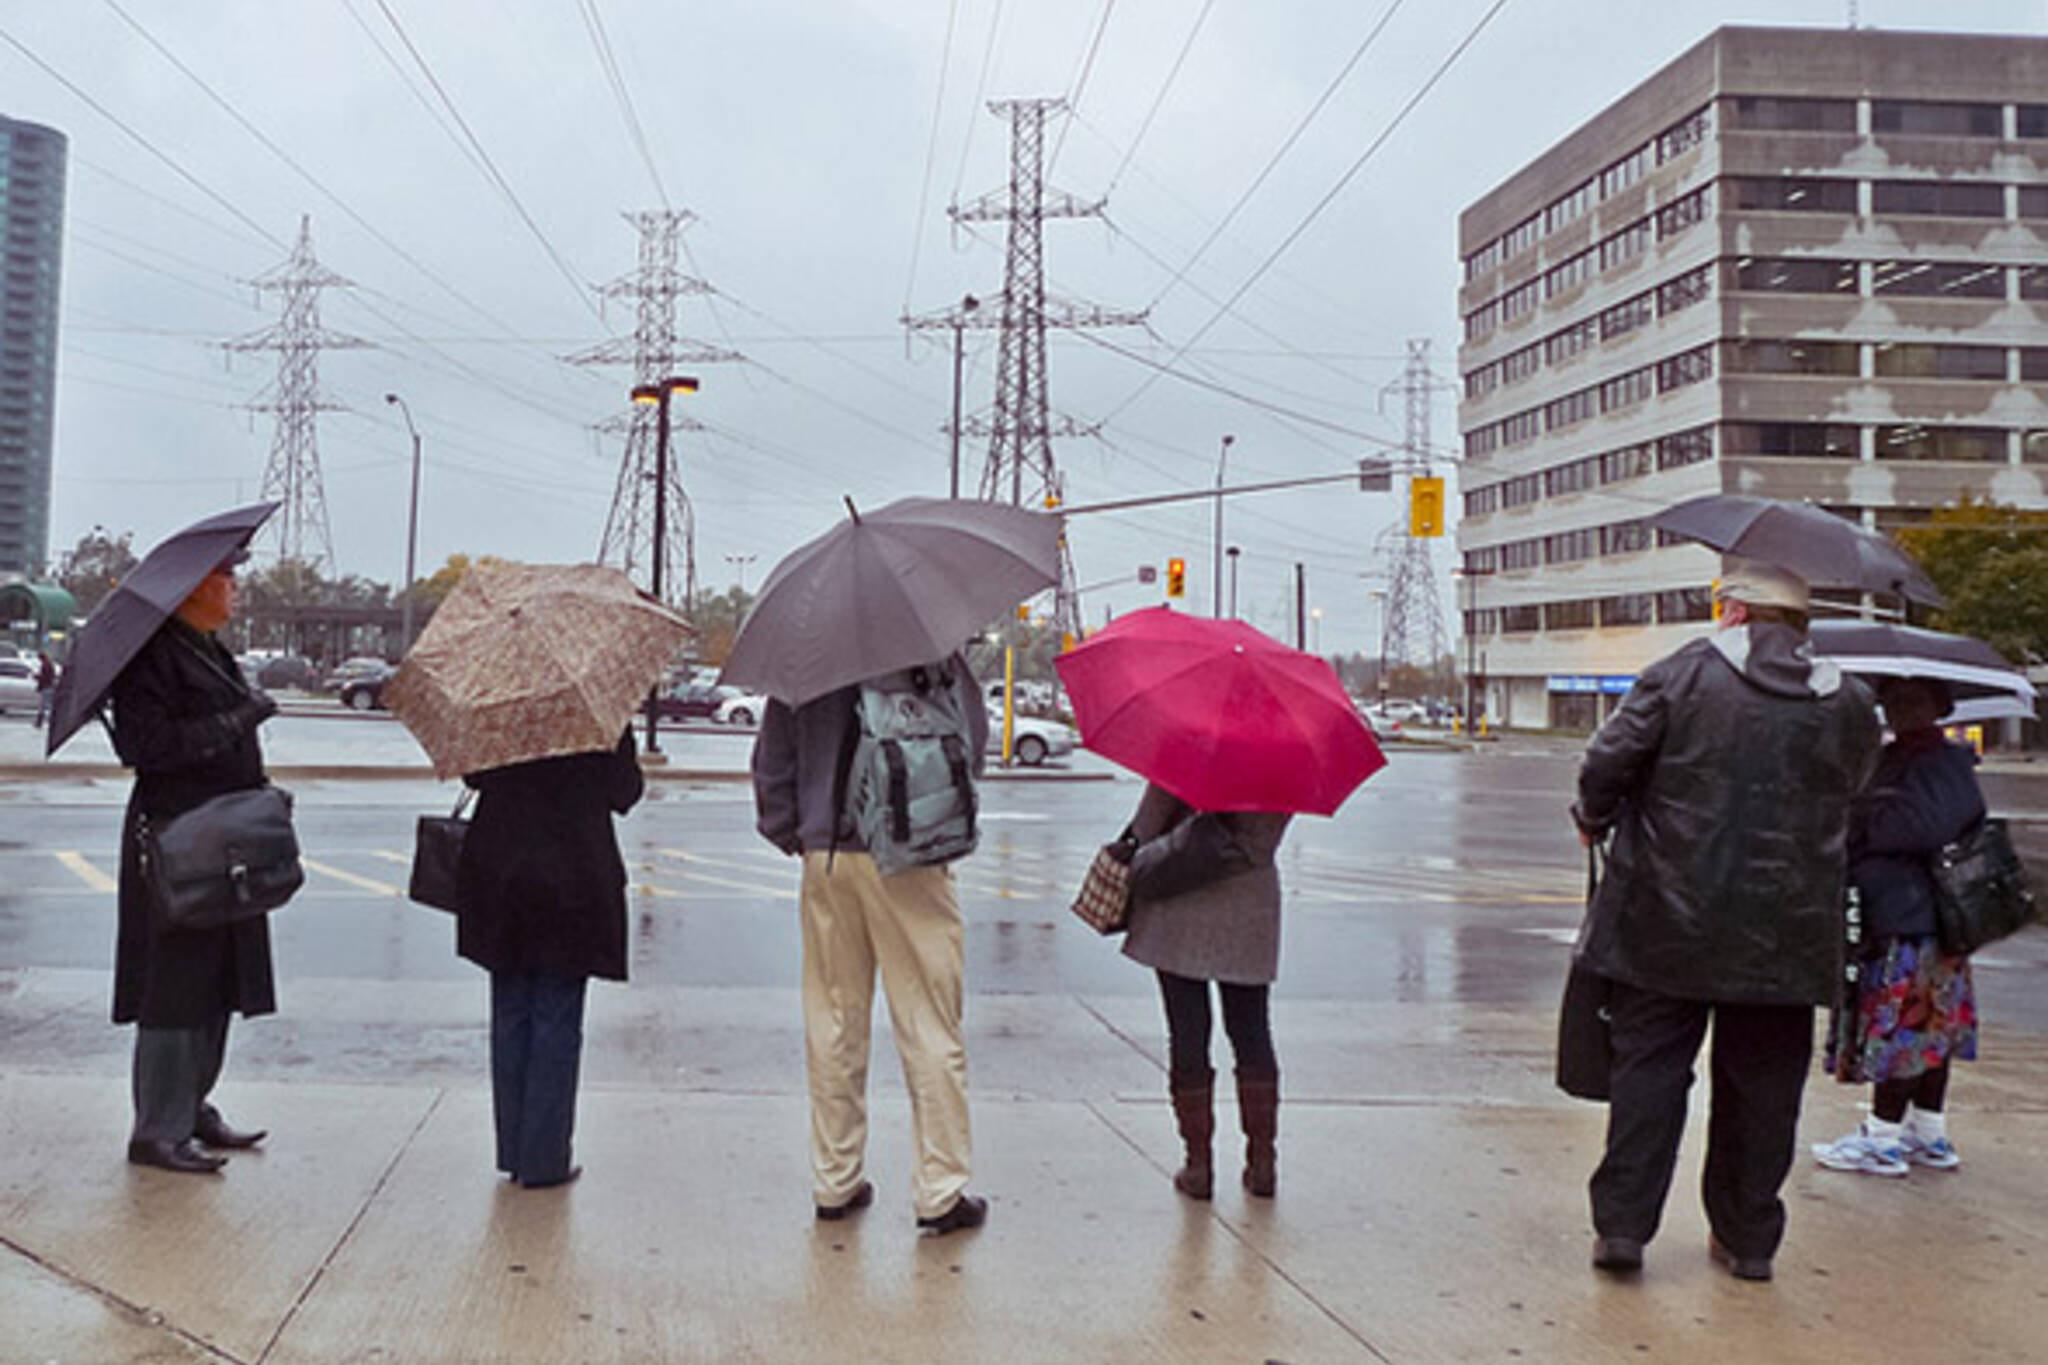 umbrella, rain, waiting